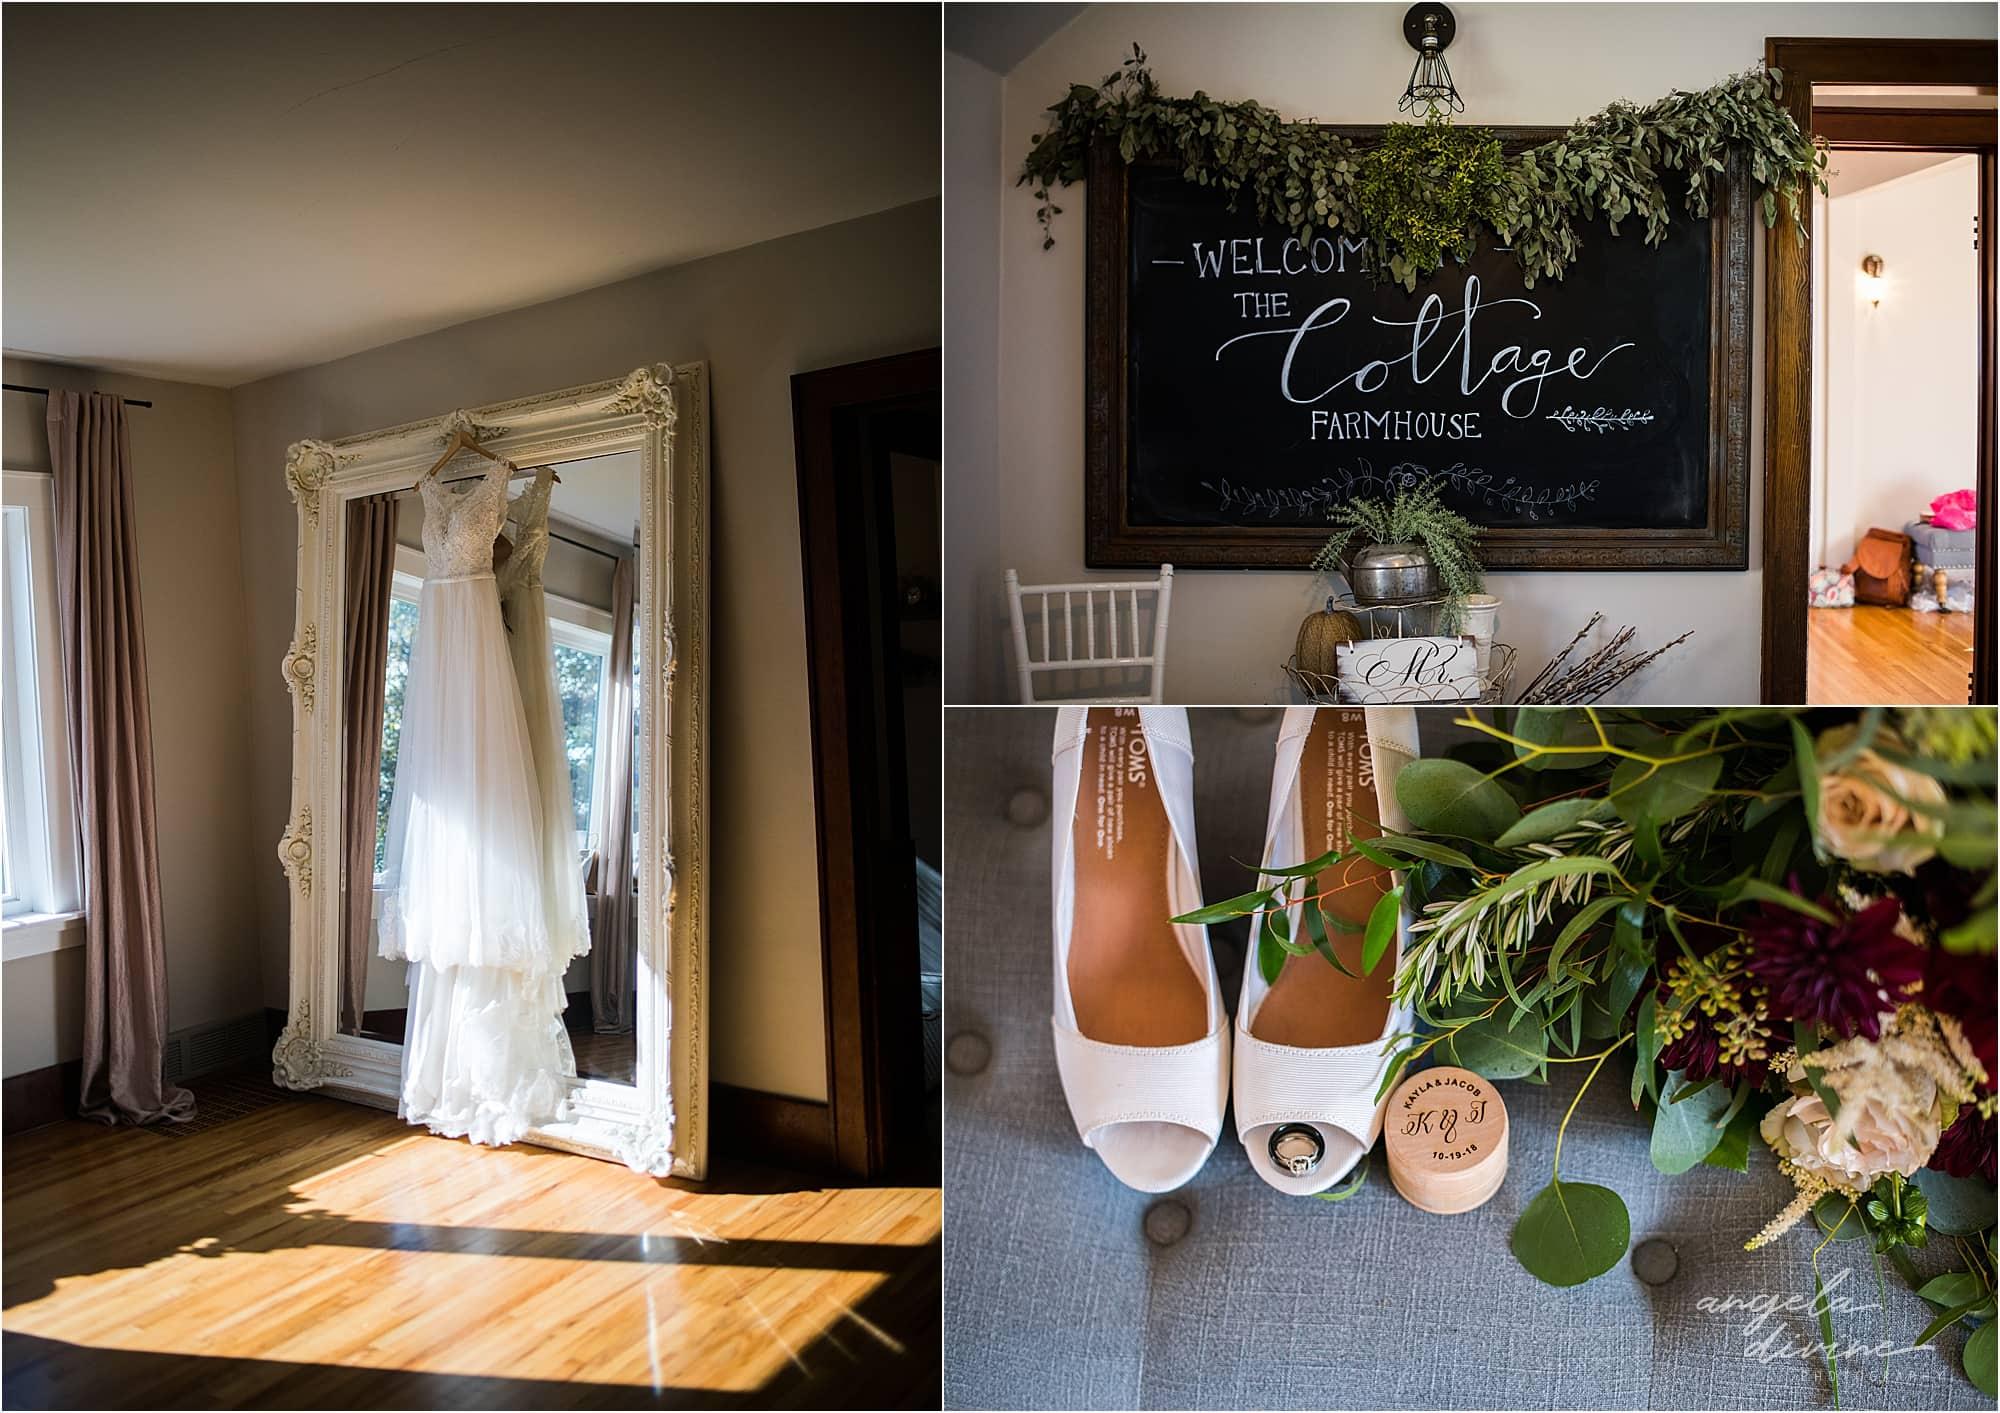 The Cottage Farmhouse Wedding bridal cottage